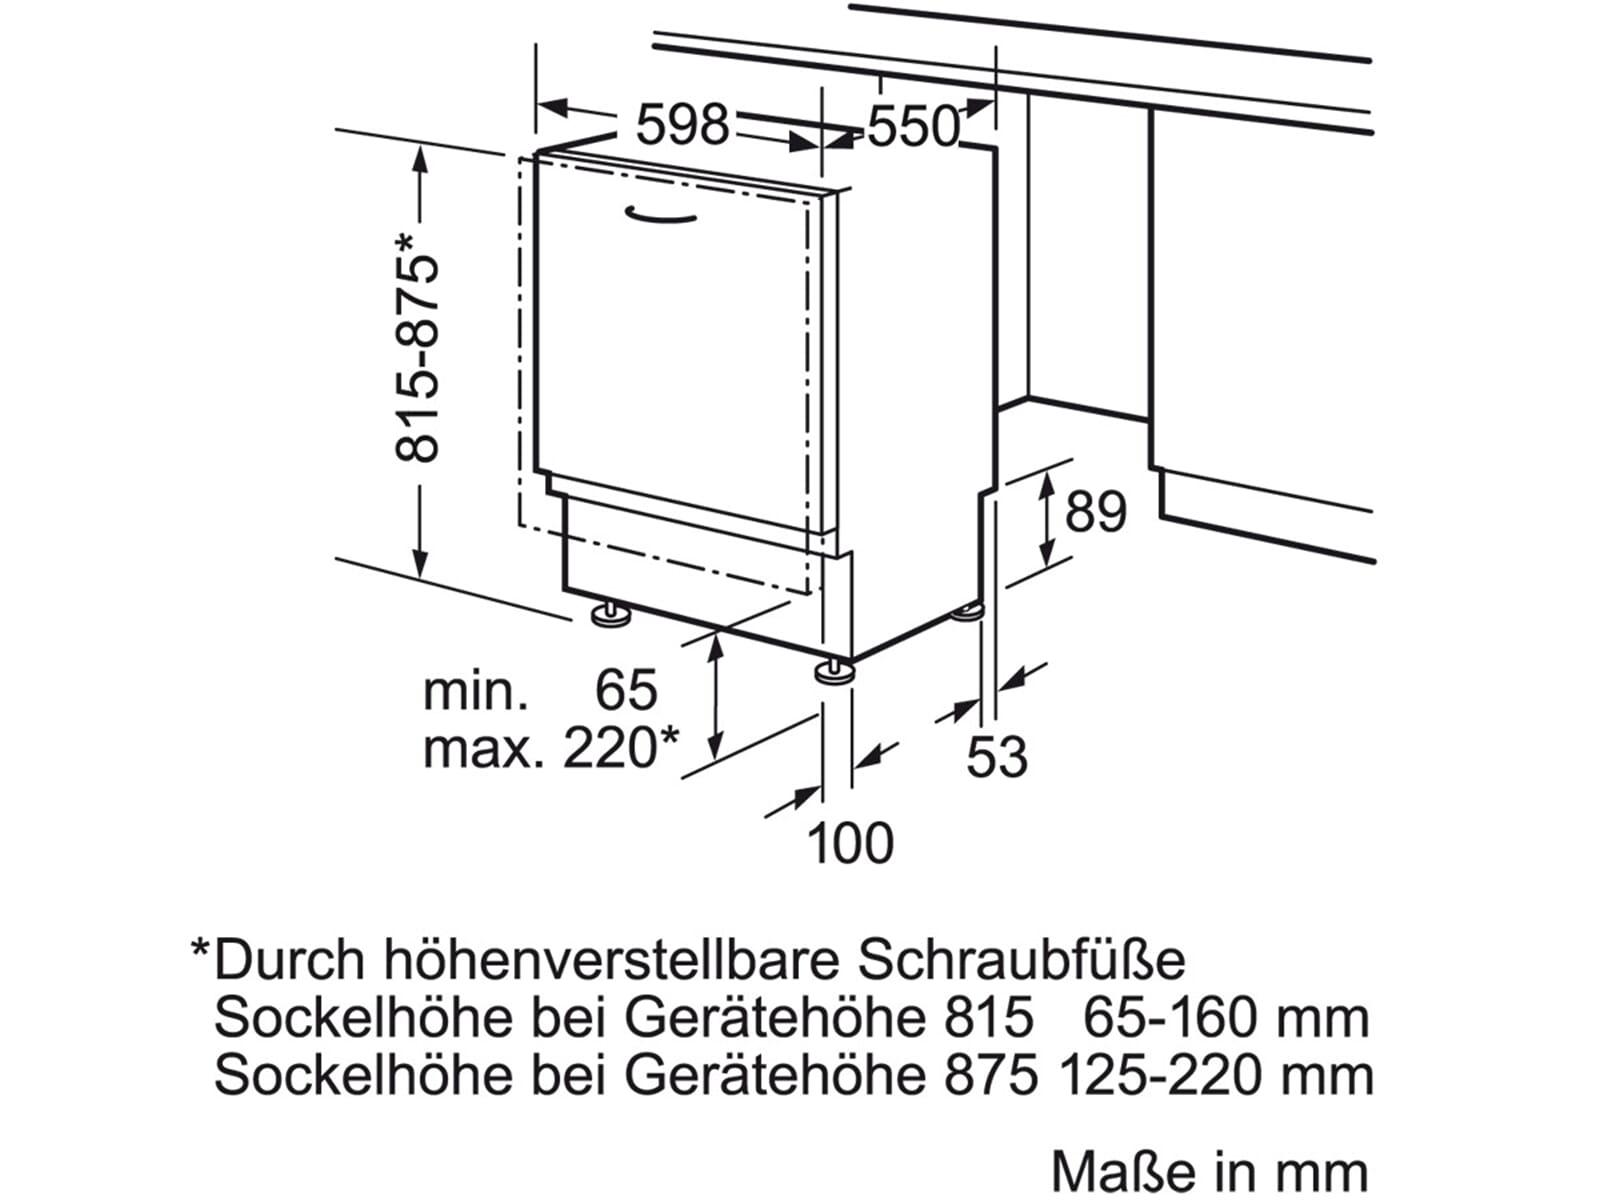 bosch sme68tx06e vollintegrierbarer einbaugeschirrsp ler ebay. Black Bedroom Furniture Sets. Home Design Ideas